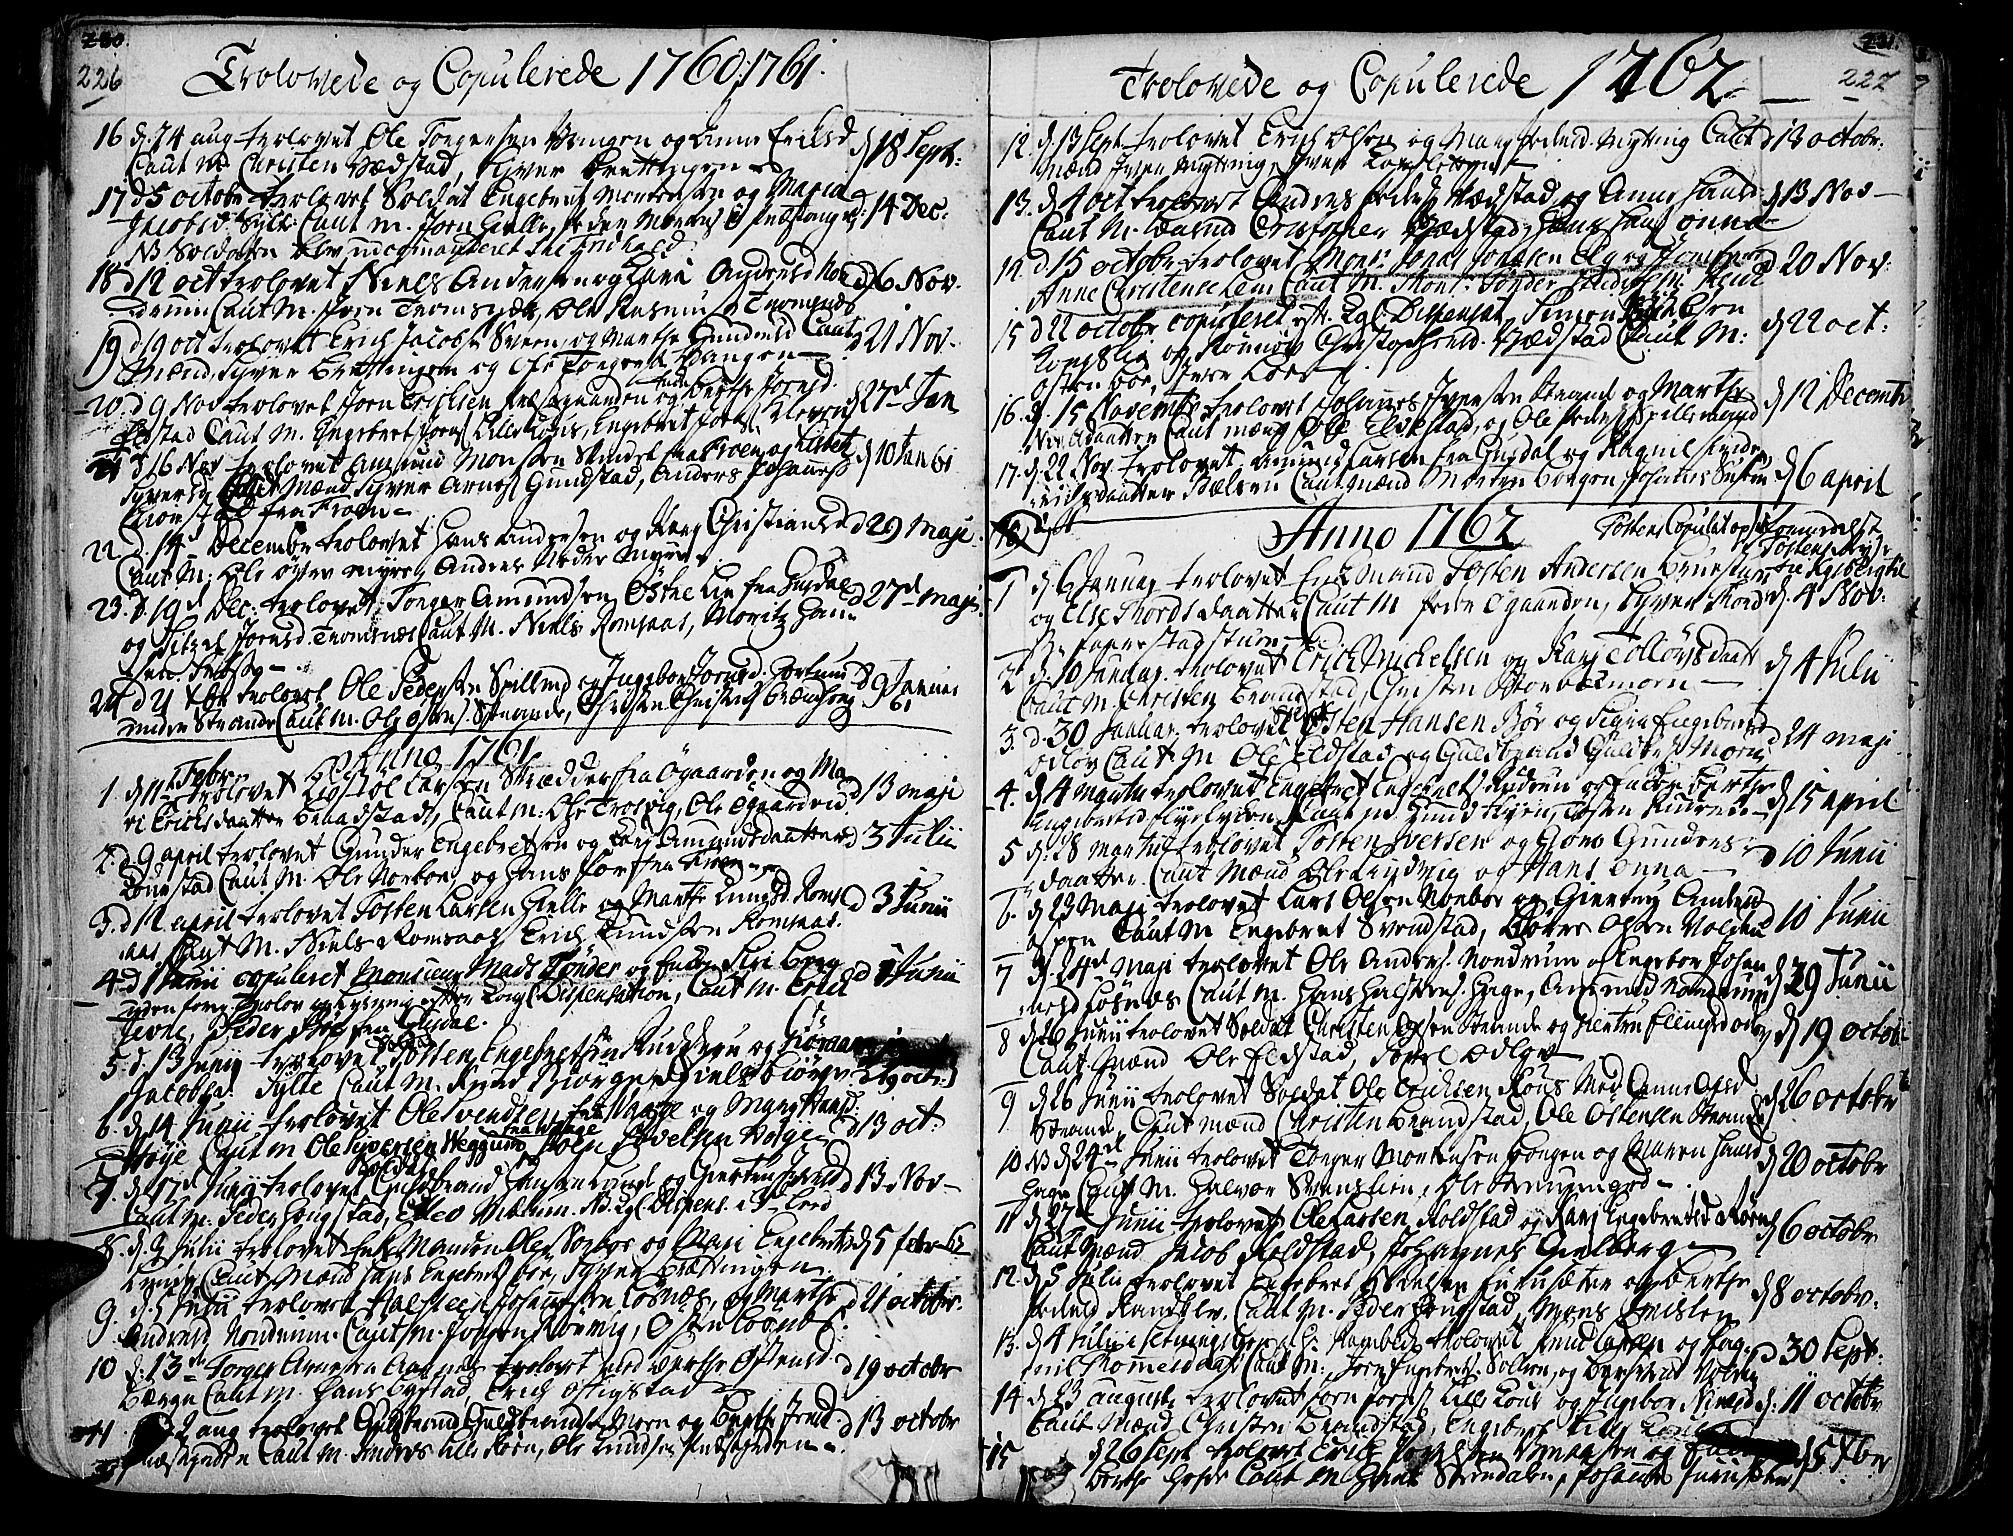 SAH, Ringebu prestekontor, Ministerialbok nr. 2, 1734-1780, s. 226-227